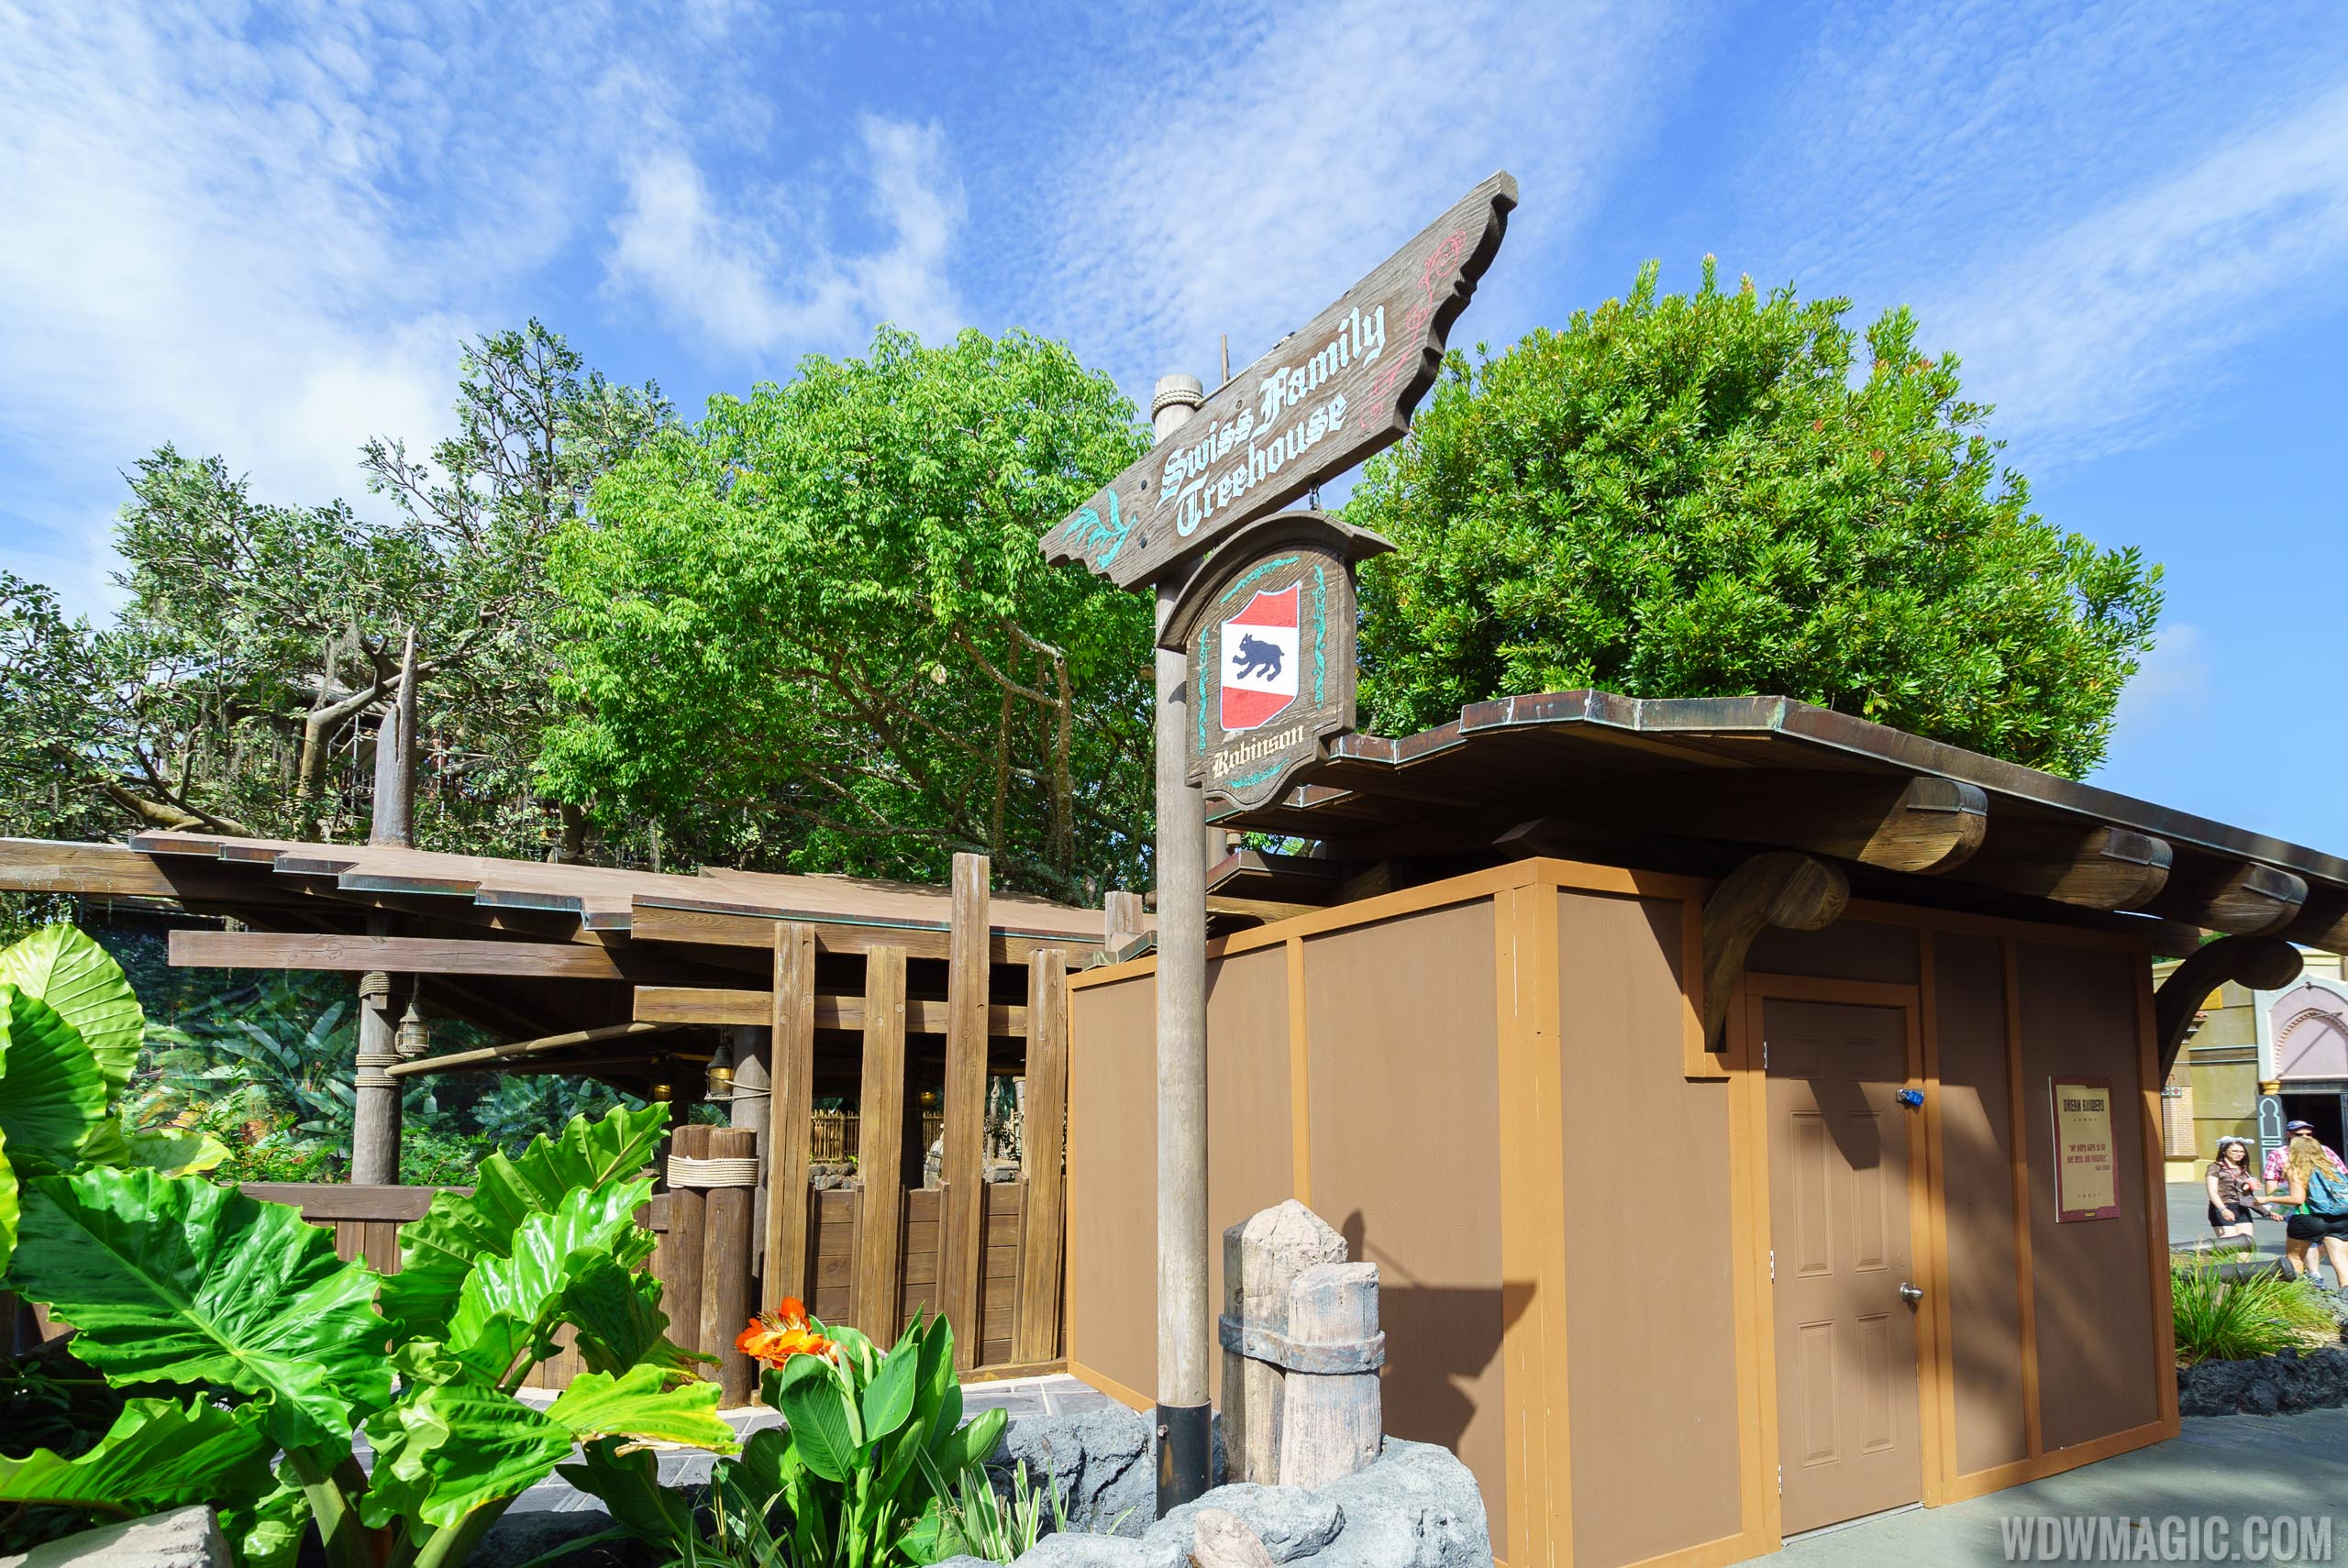 Swiss Family Robinson Tree house refurbishment extended